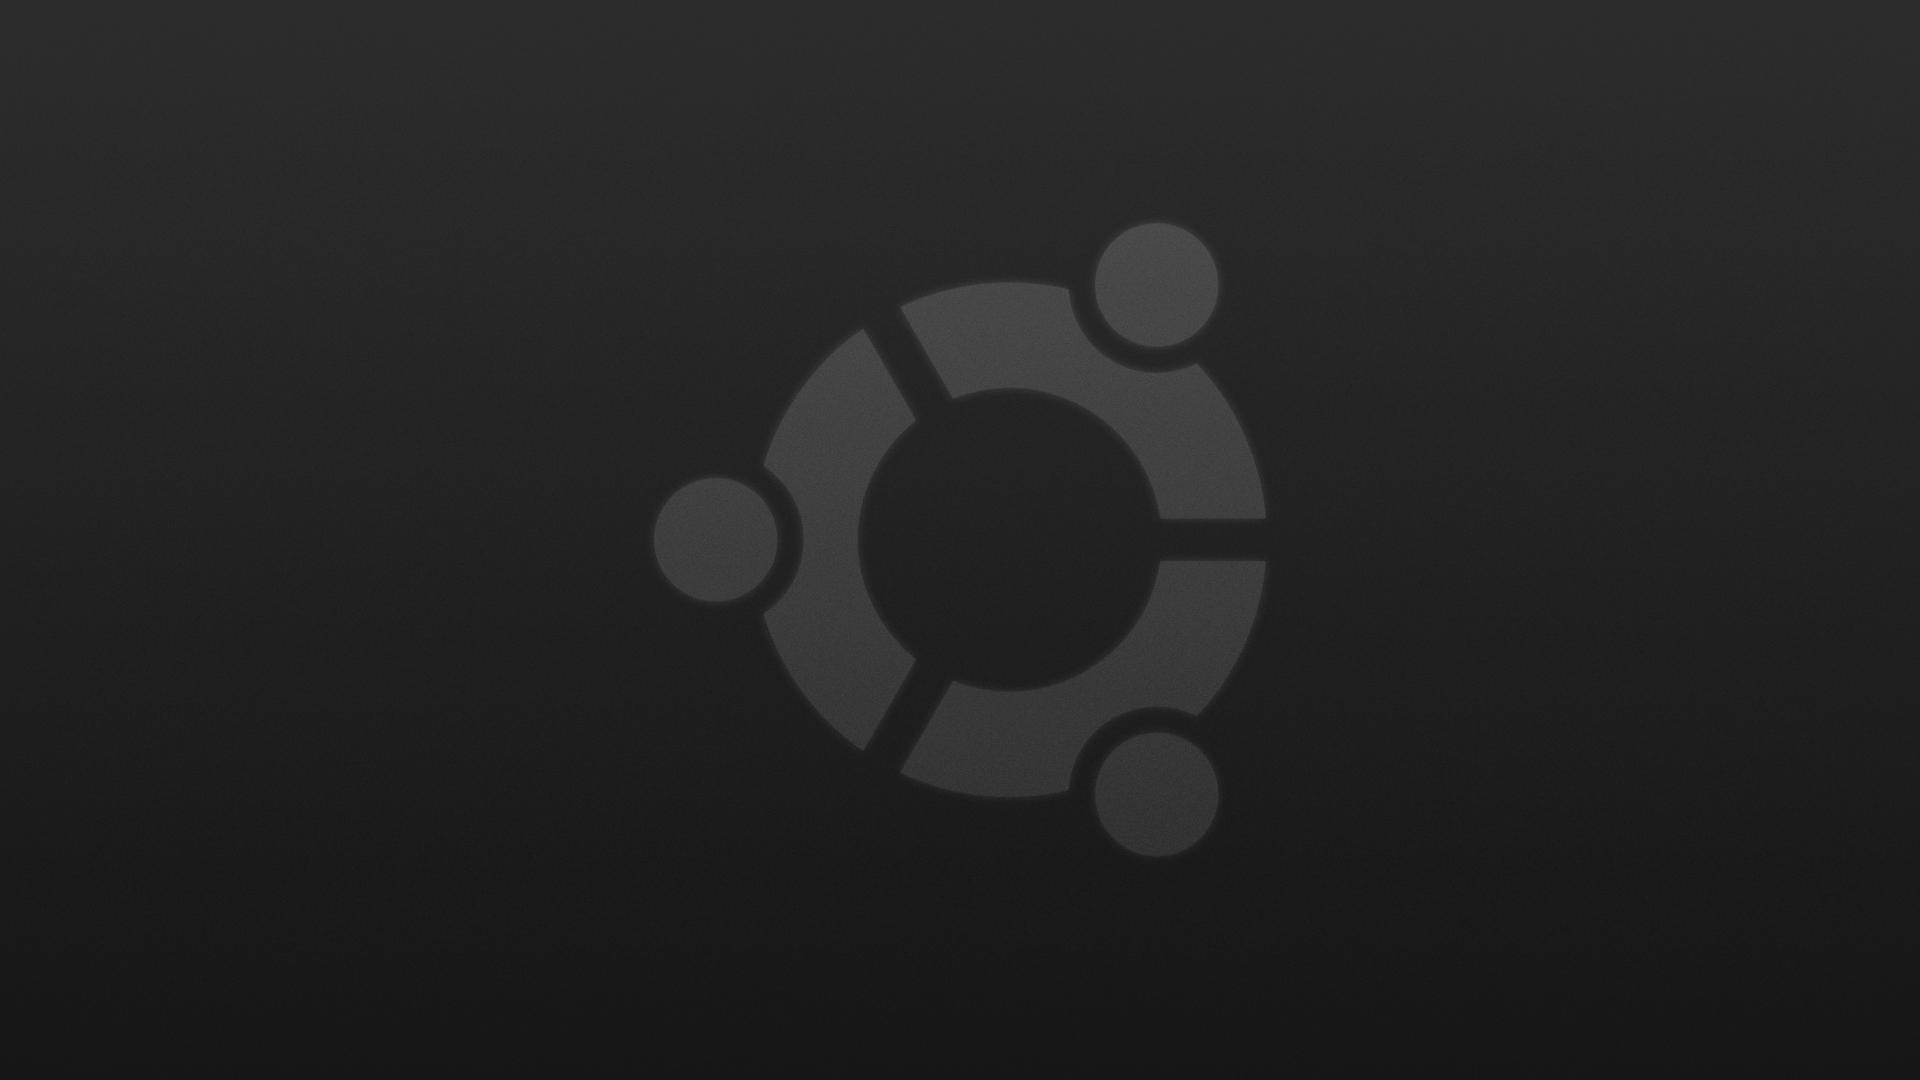 Ubuntu Dark Simple Wallpaper by DefectiveDre 1920x1080